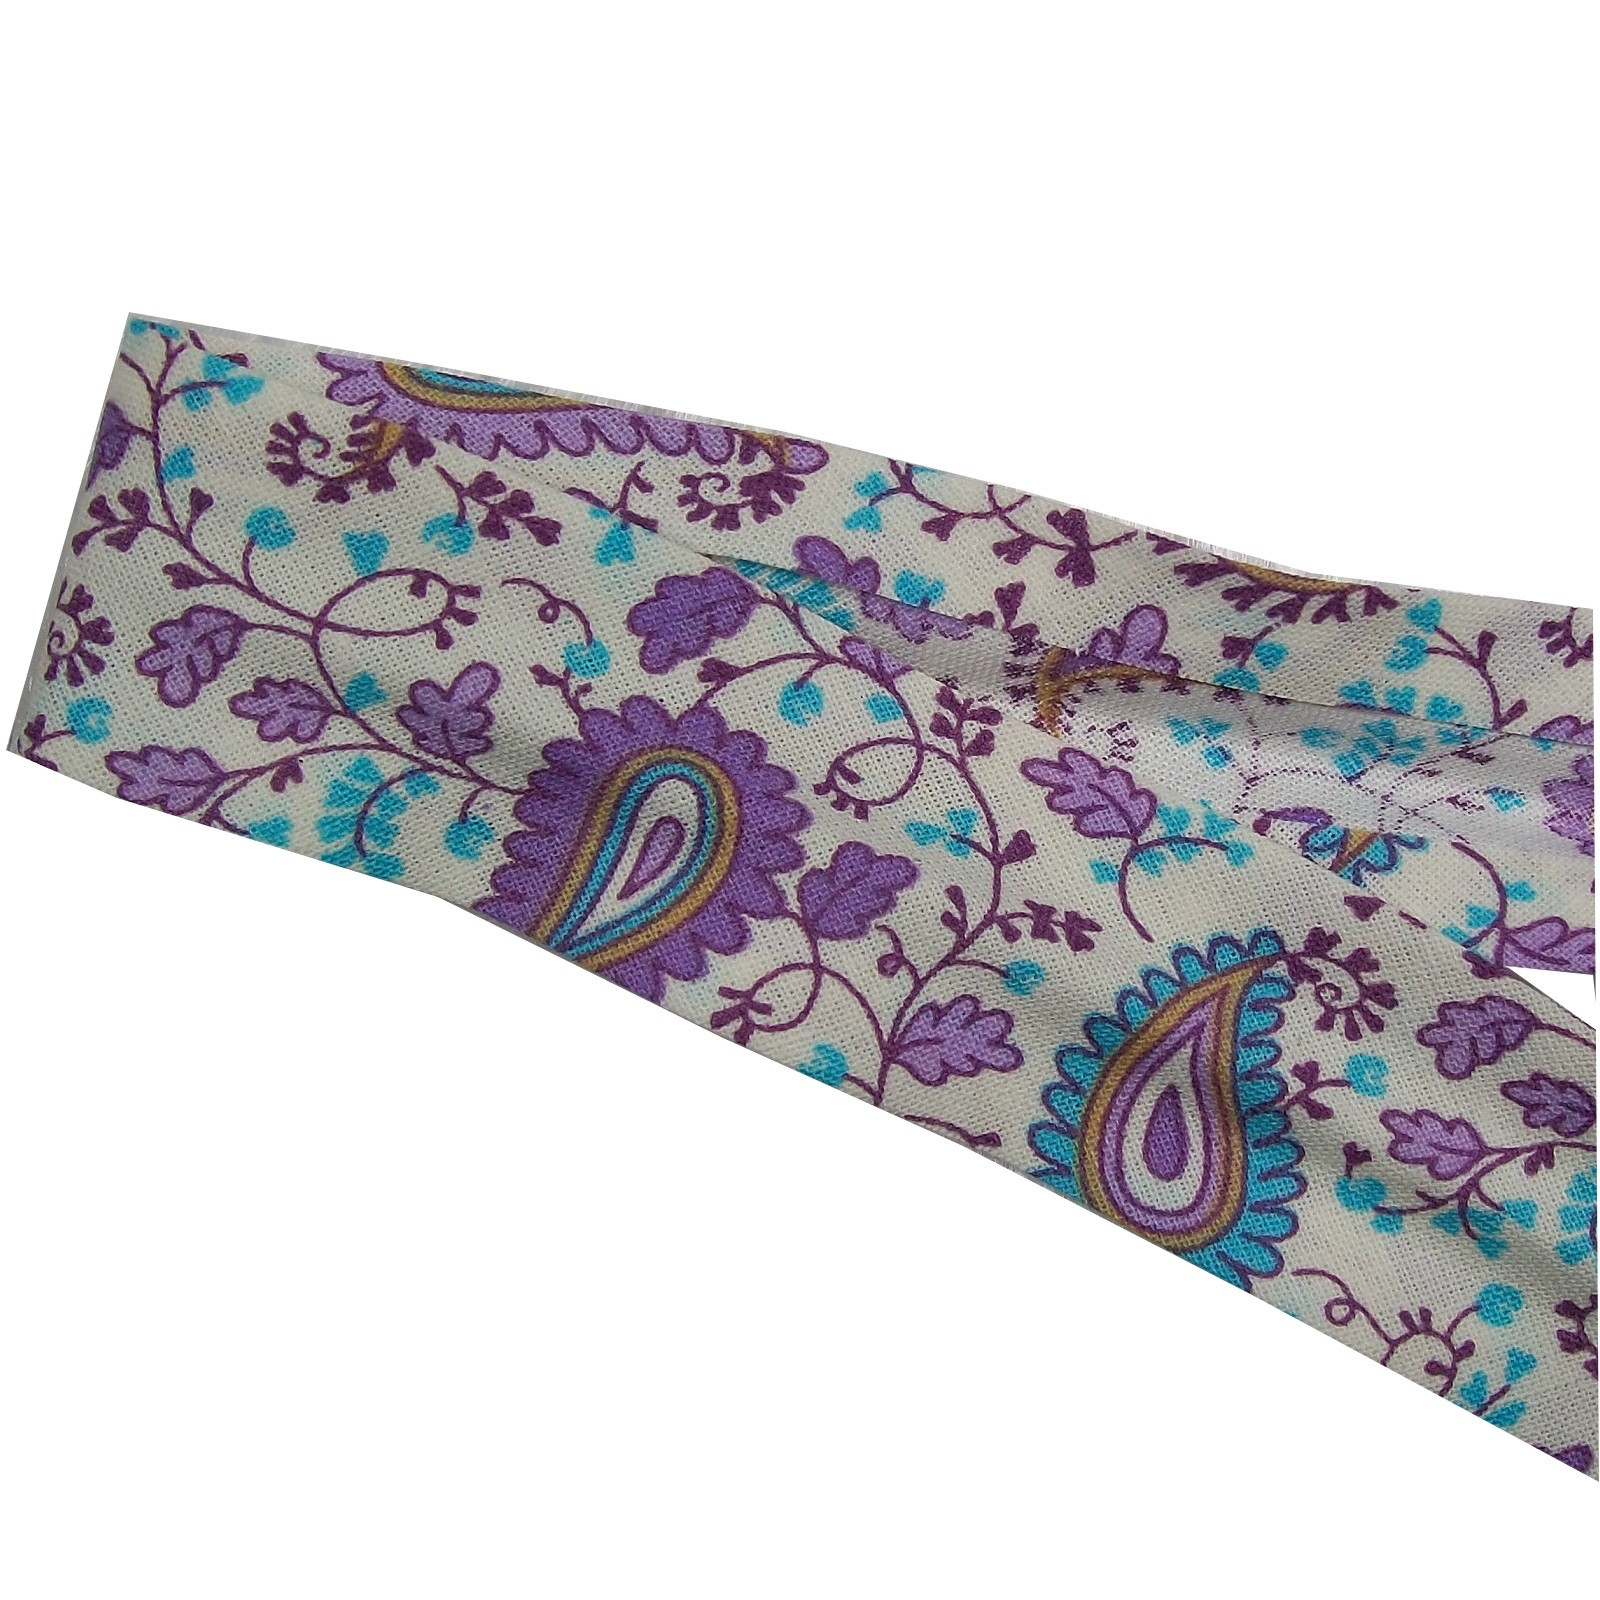 Bias Binding Patterned Cotton 25mm wide Blue Lilac Paisley 1 metre length